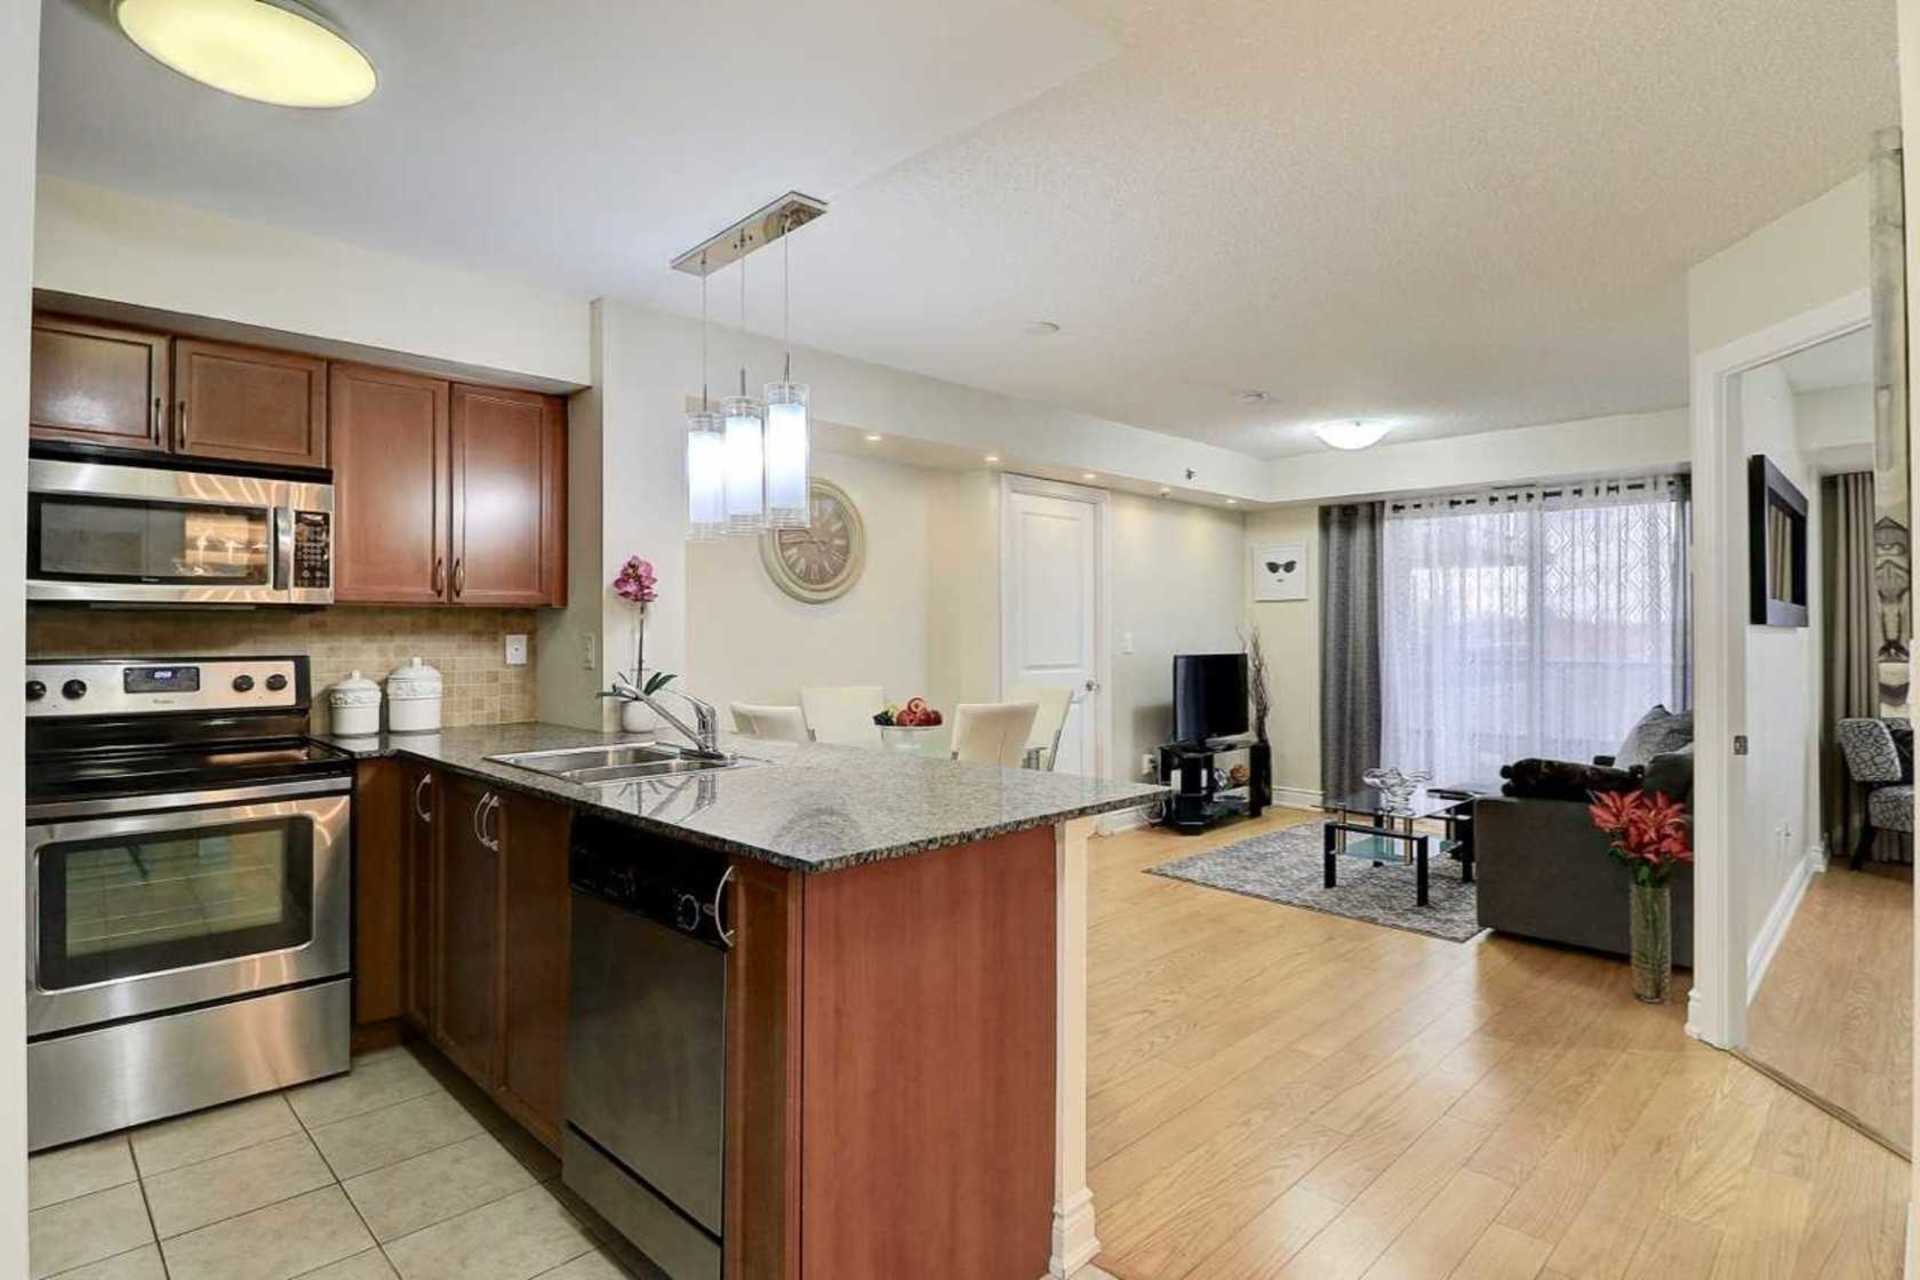 Kitchen at 401 - 760 Sheppard Avenue W, Bathurst Manor, Toronto